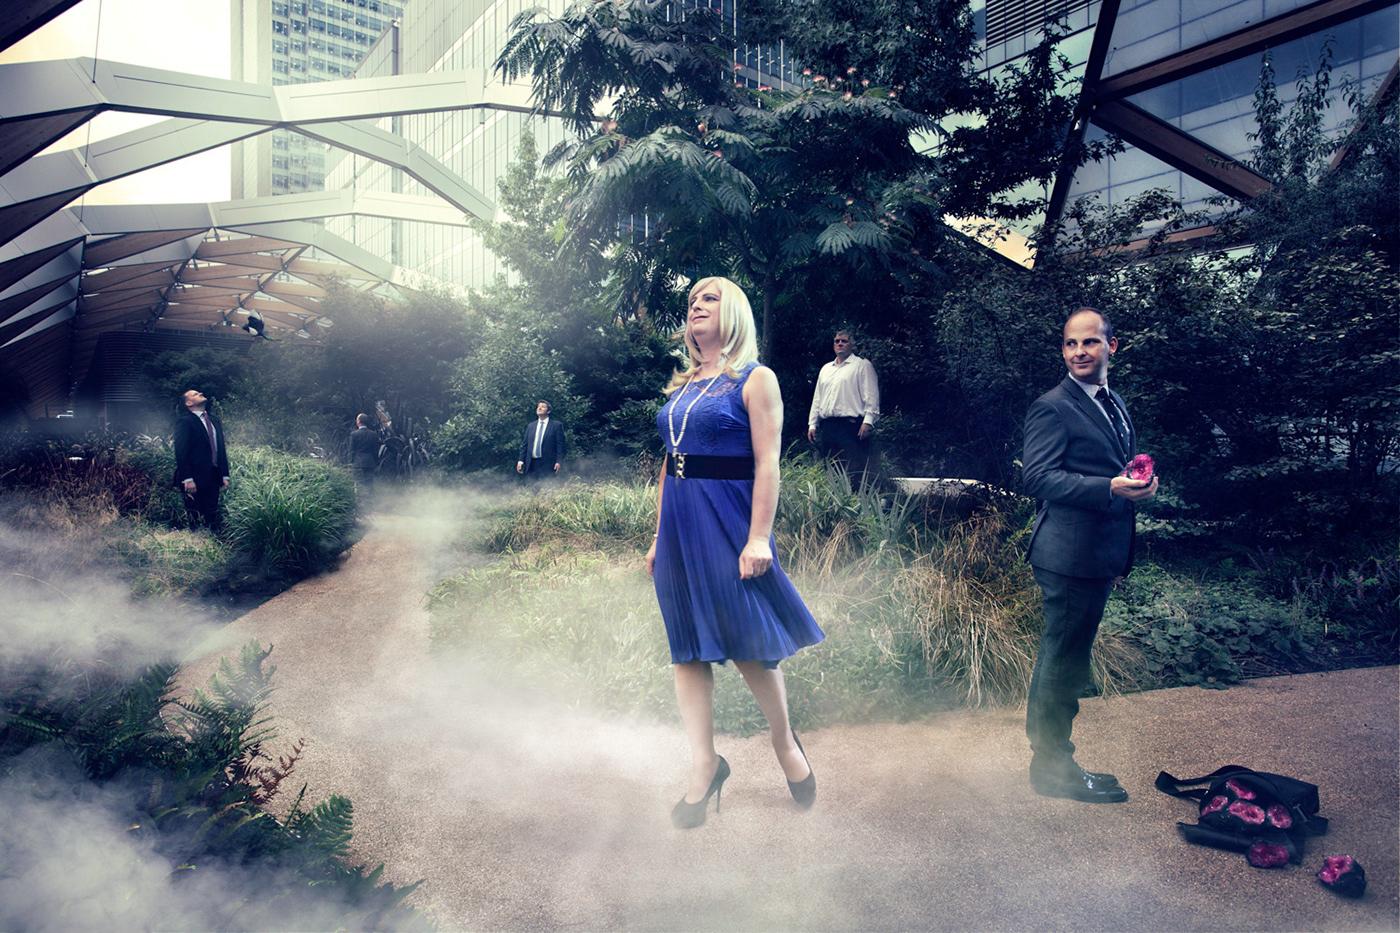 Portraiture psychology FINEART bespoke studio location diogo duarte conceptual Photography  self